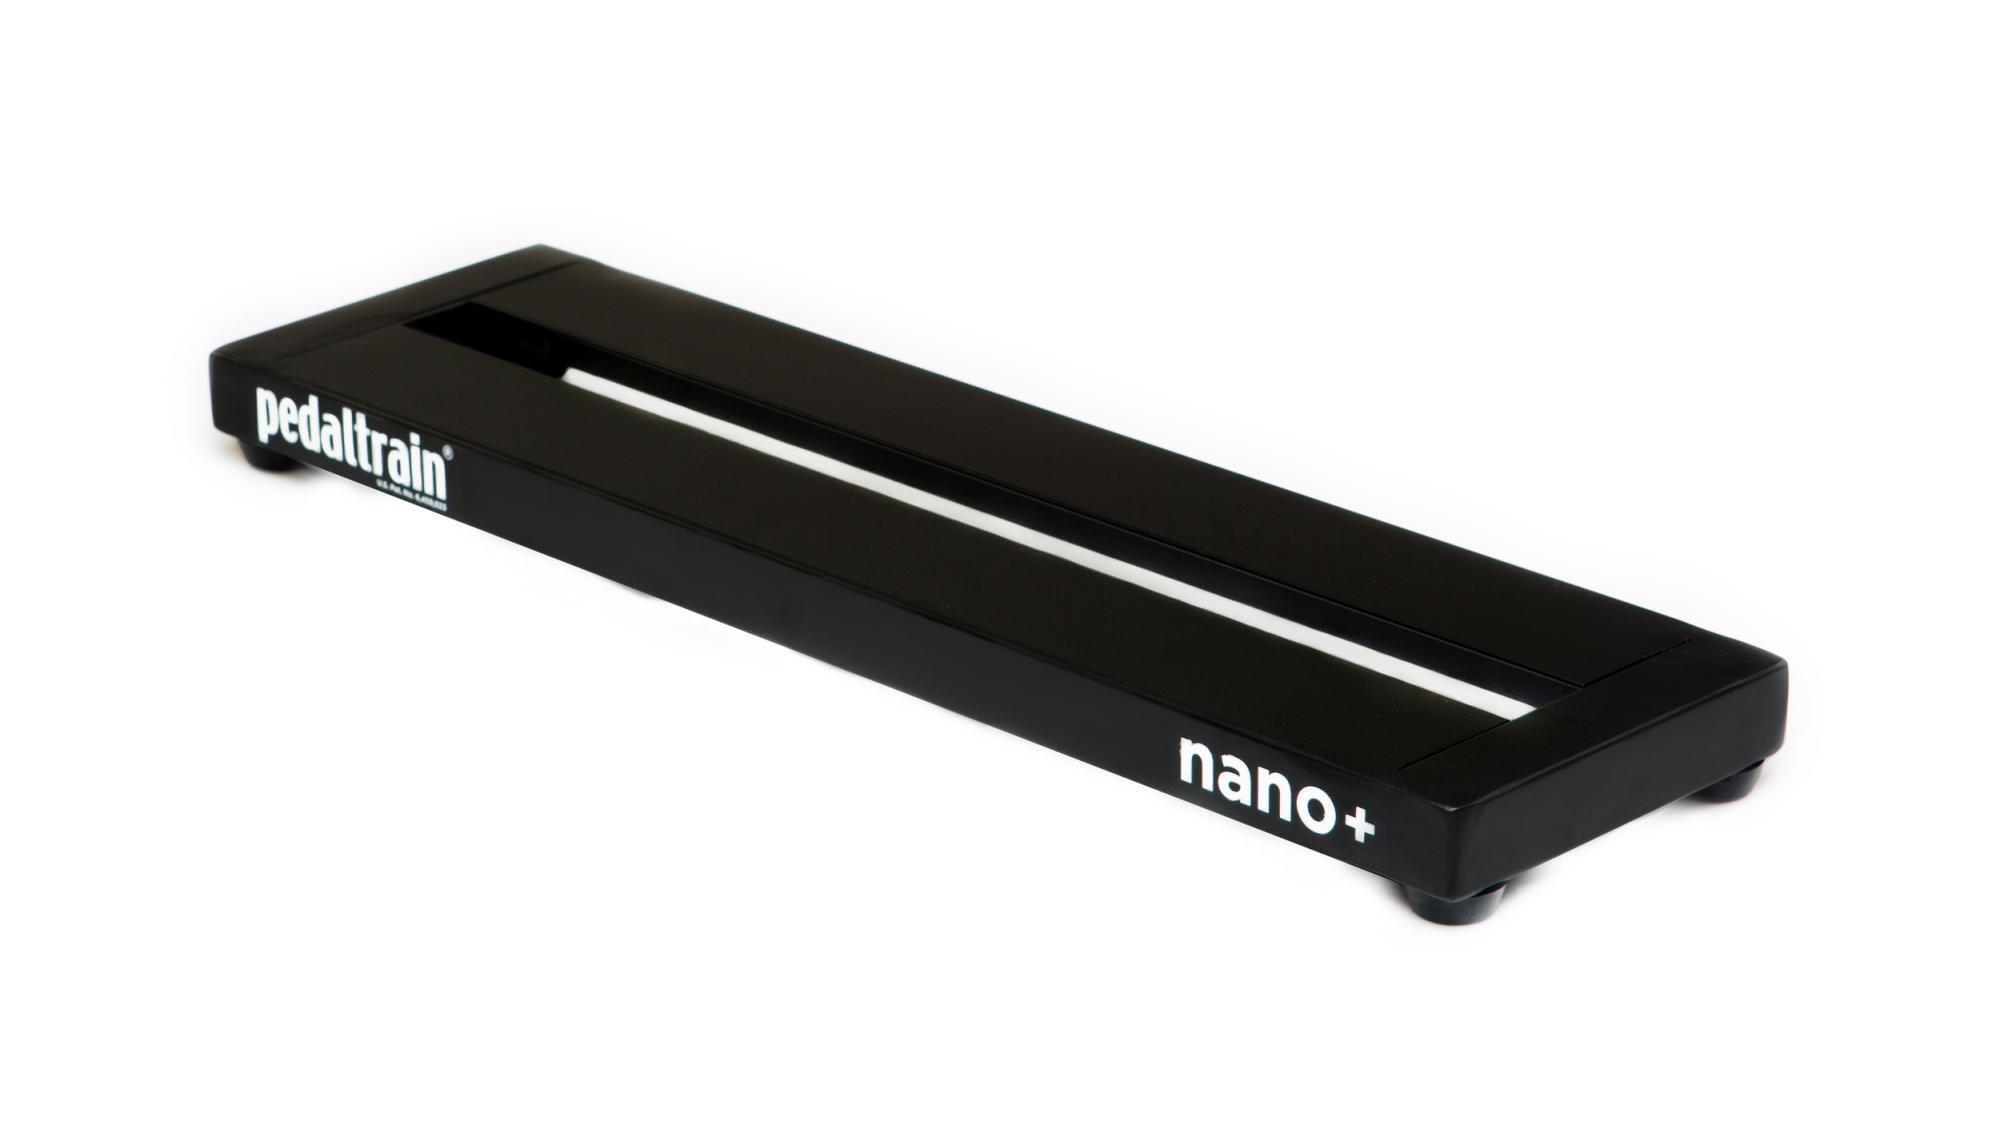 Pedaltrain Nano+ w/bag